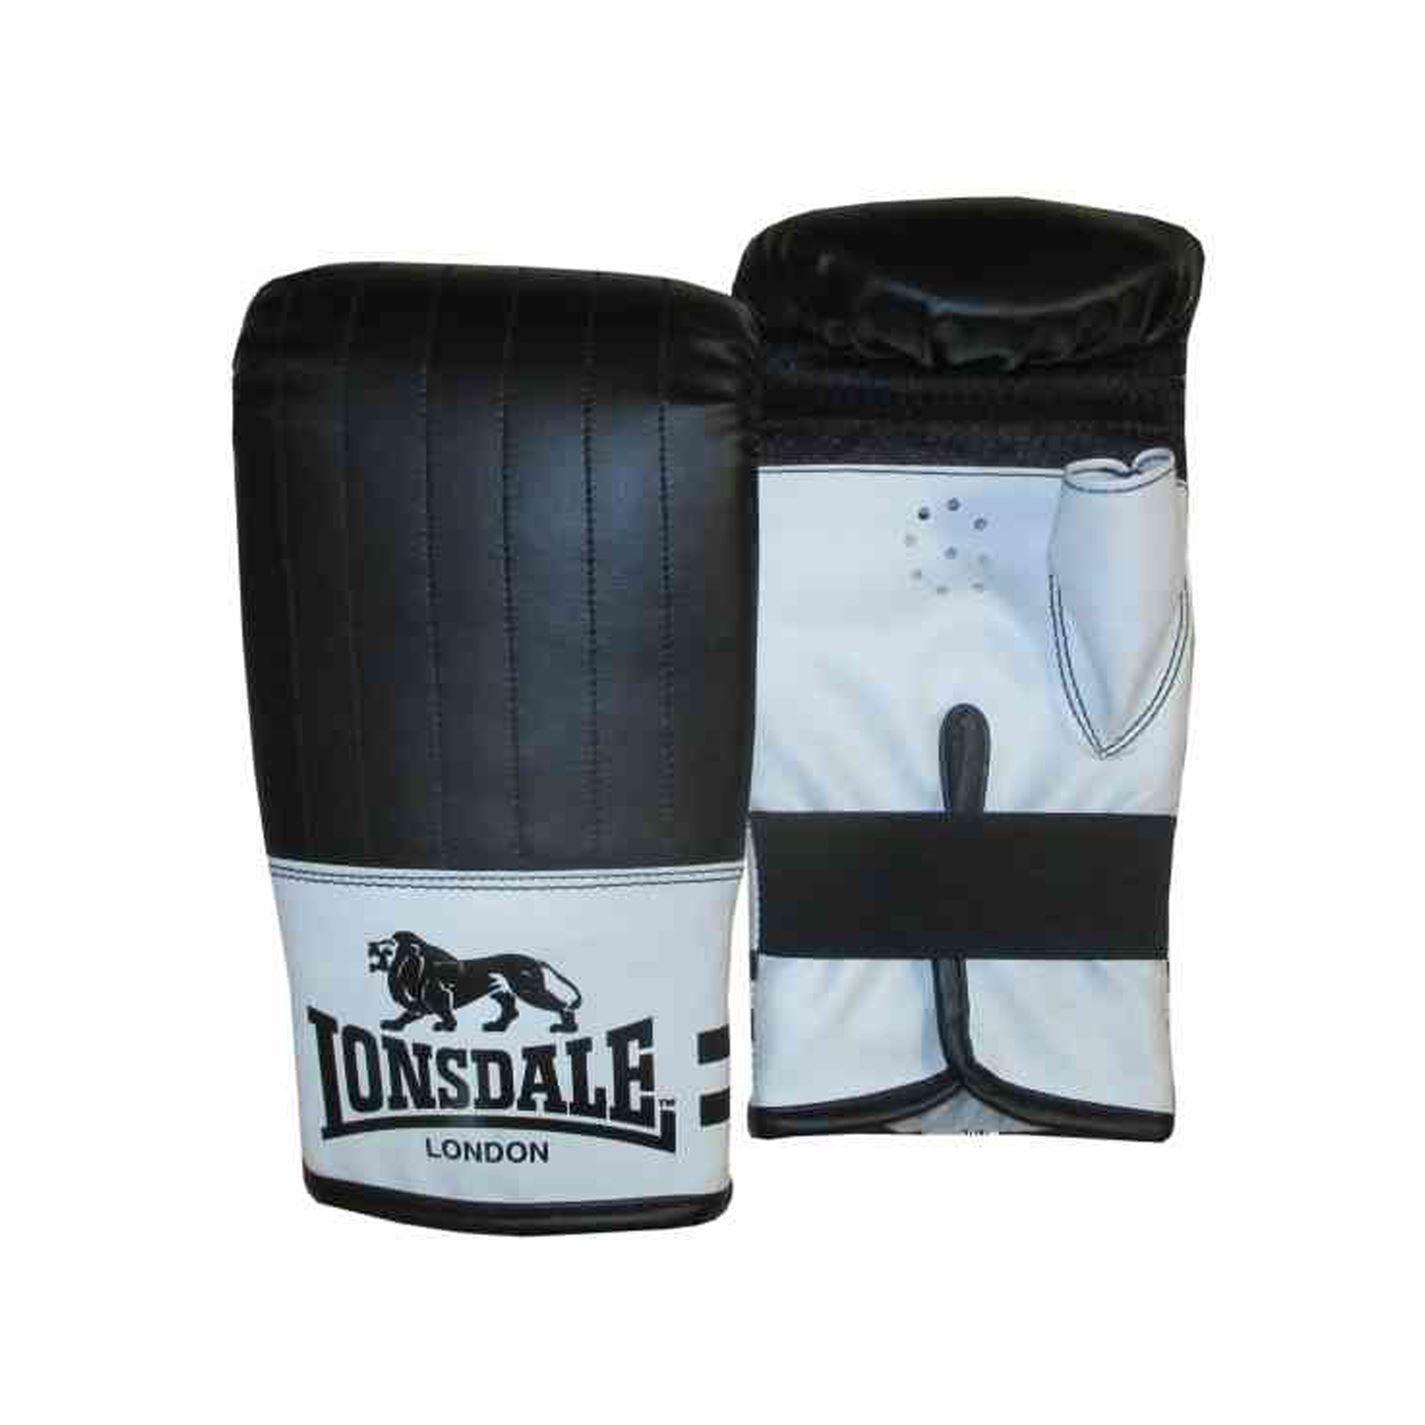 Lonsdale Contender Mitones Guantes Boxeo Kick Mma Hand Wraps Fight Entrenar